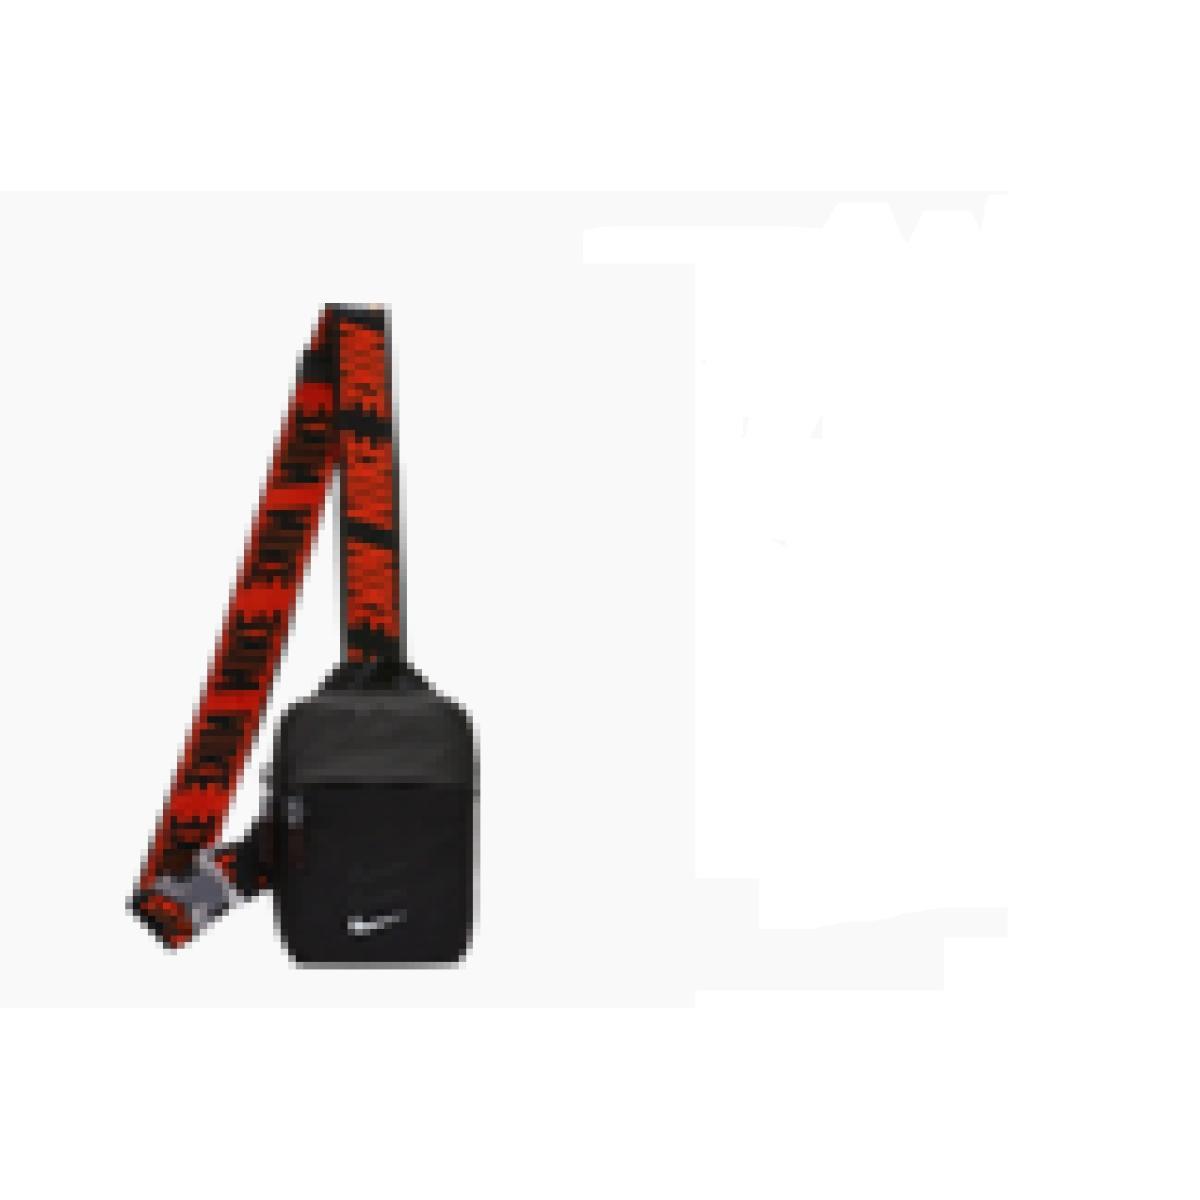 Bolsa Unisex Nike Ba5904-010 Advance Preto/vermelho